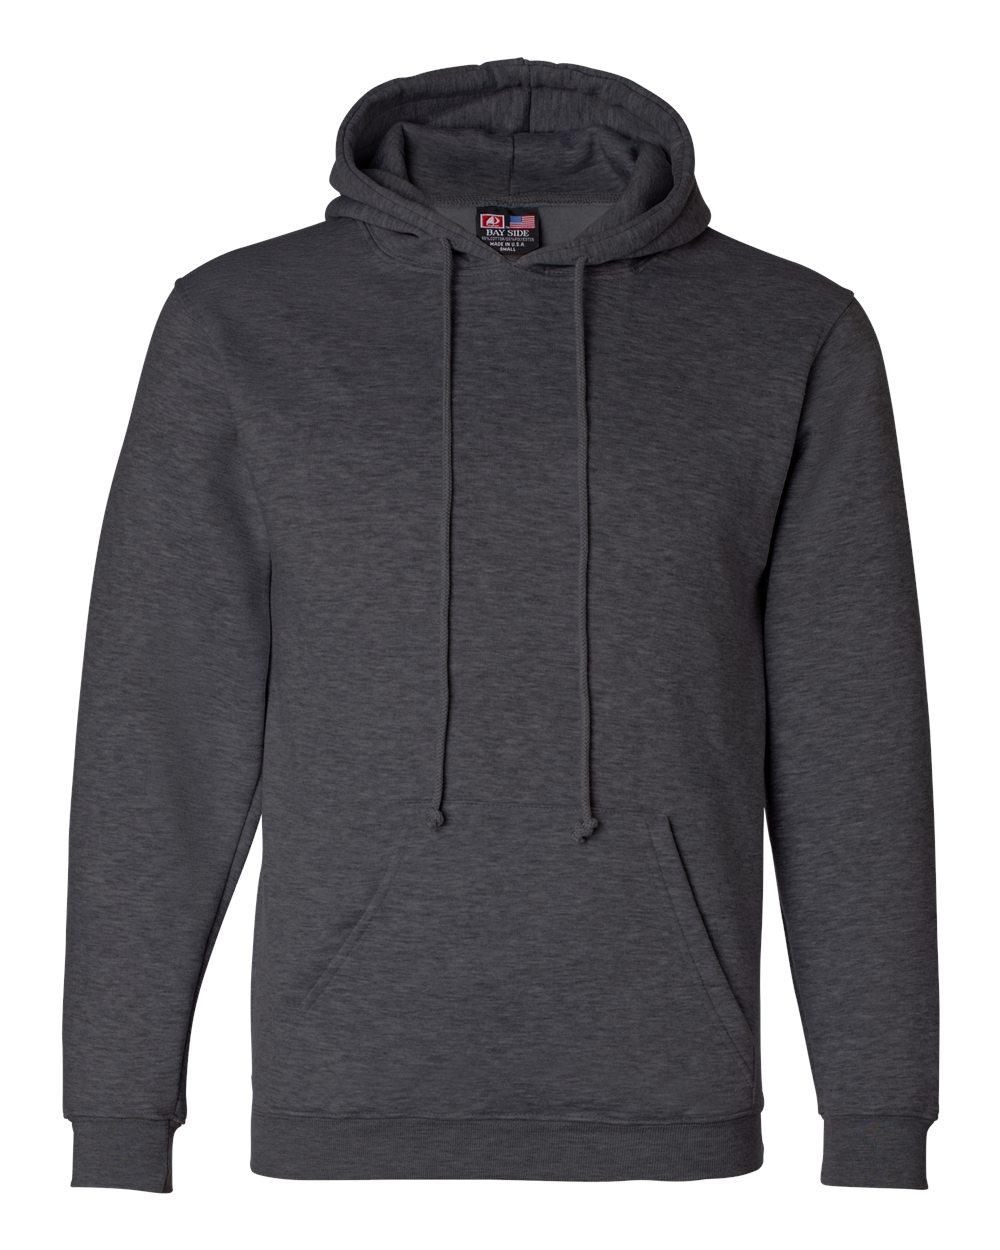 Bayside-Mens-Blank-USA-Made-Hooded-Sweatshirt-960-up-to-6XL miniature 12